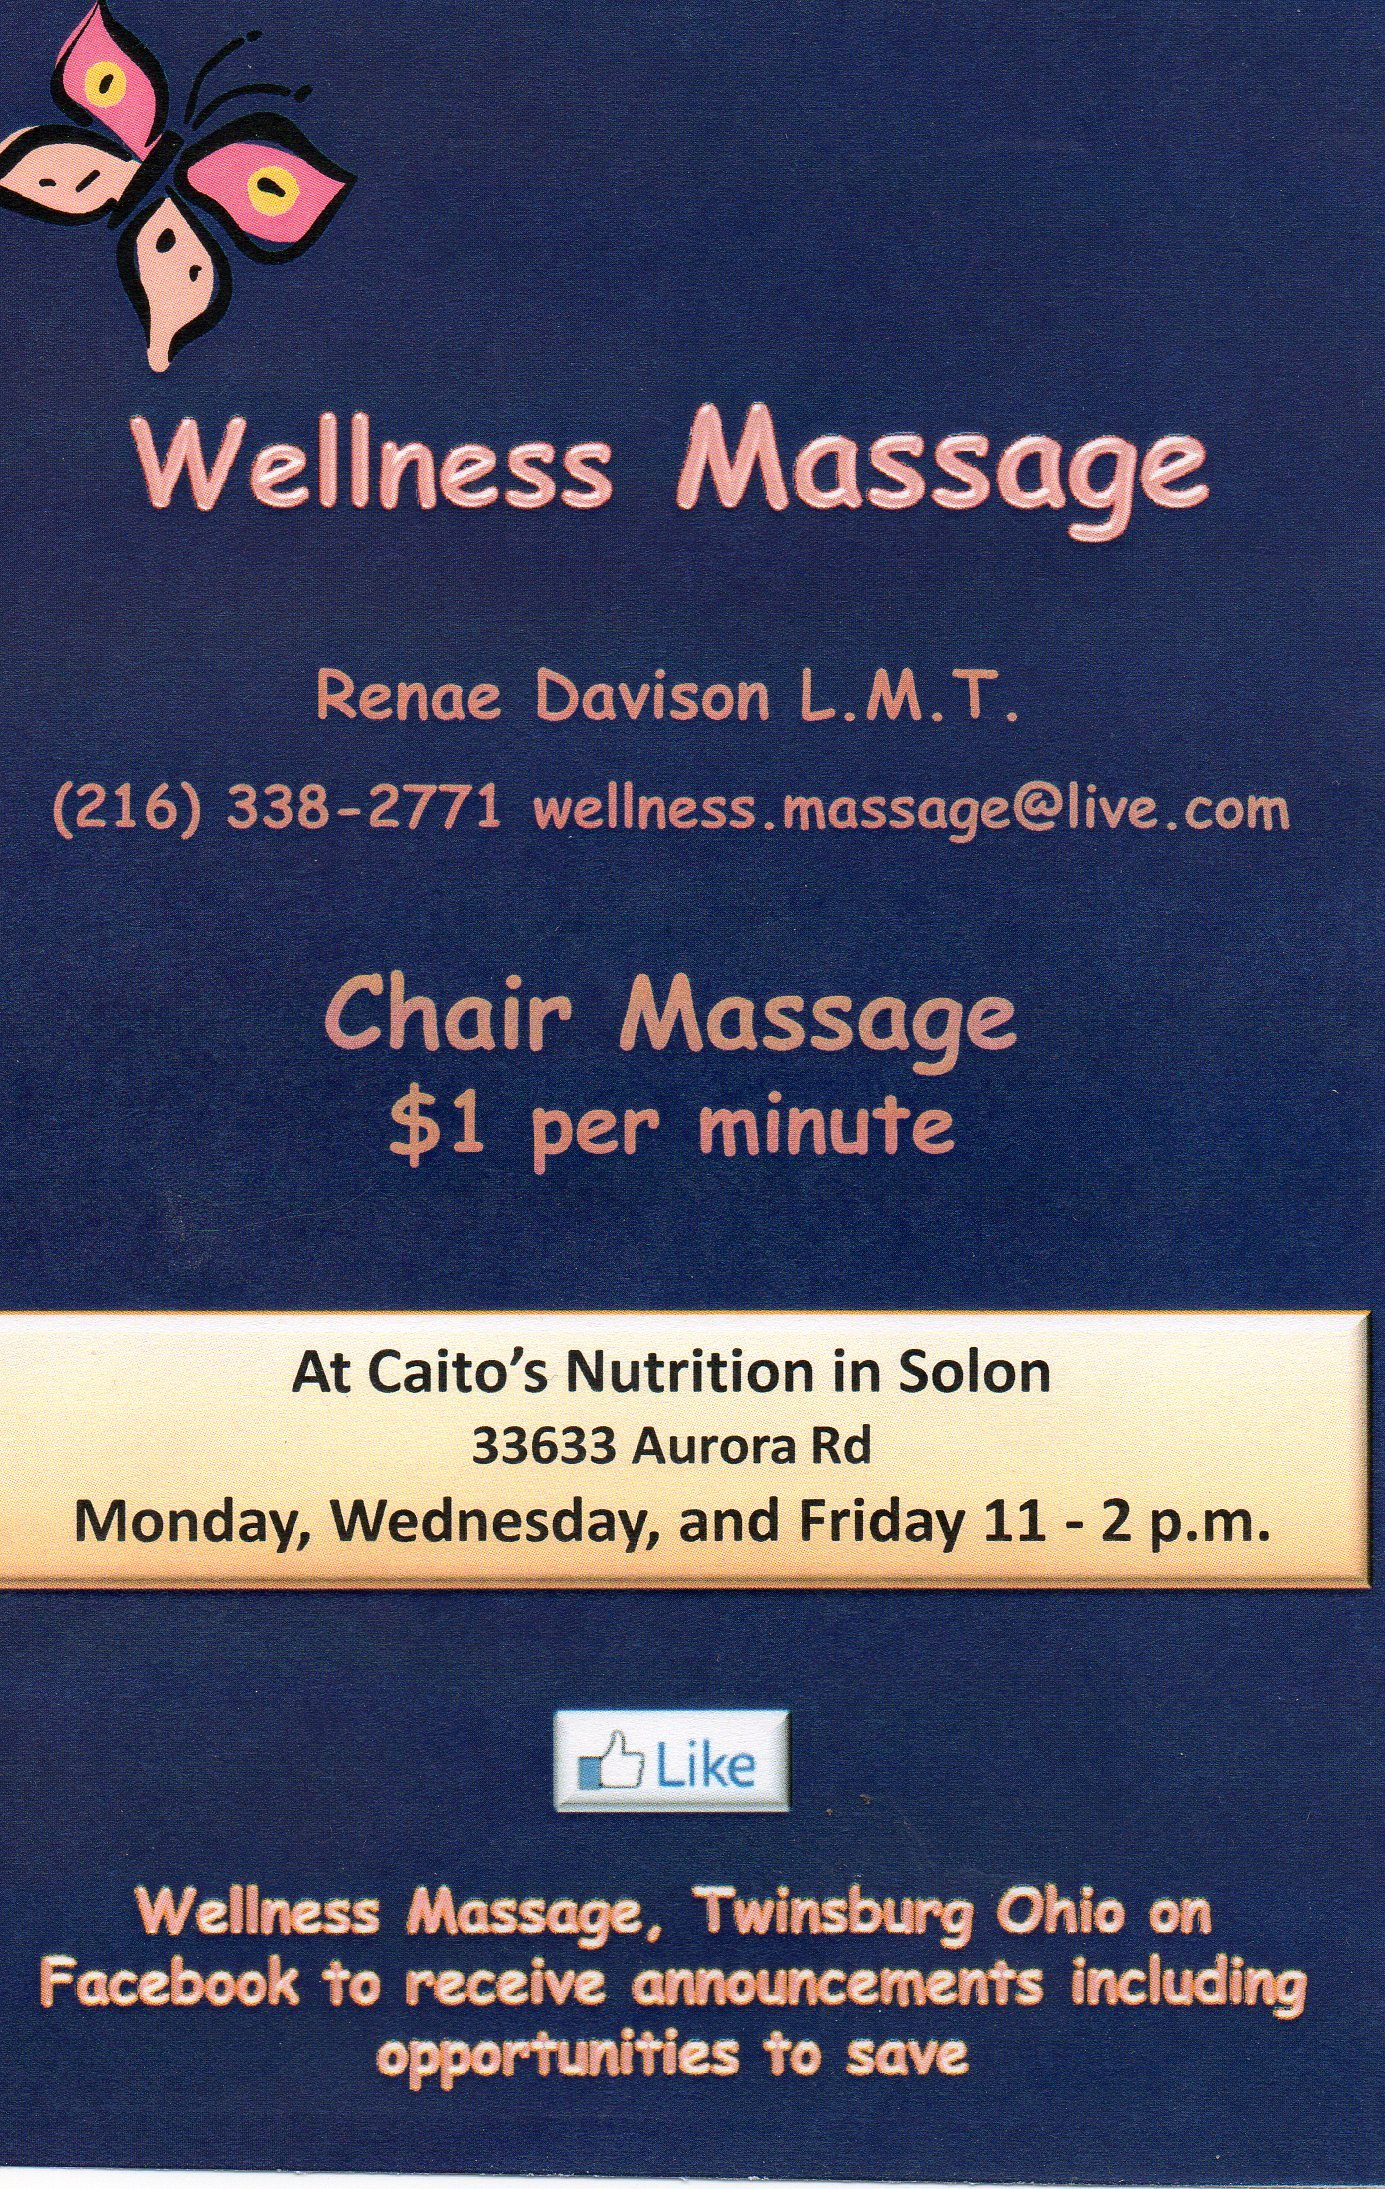 Massage Flyer Template Free Best Of Wellness Massage Ohio